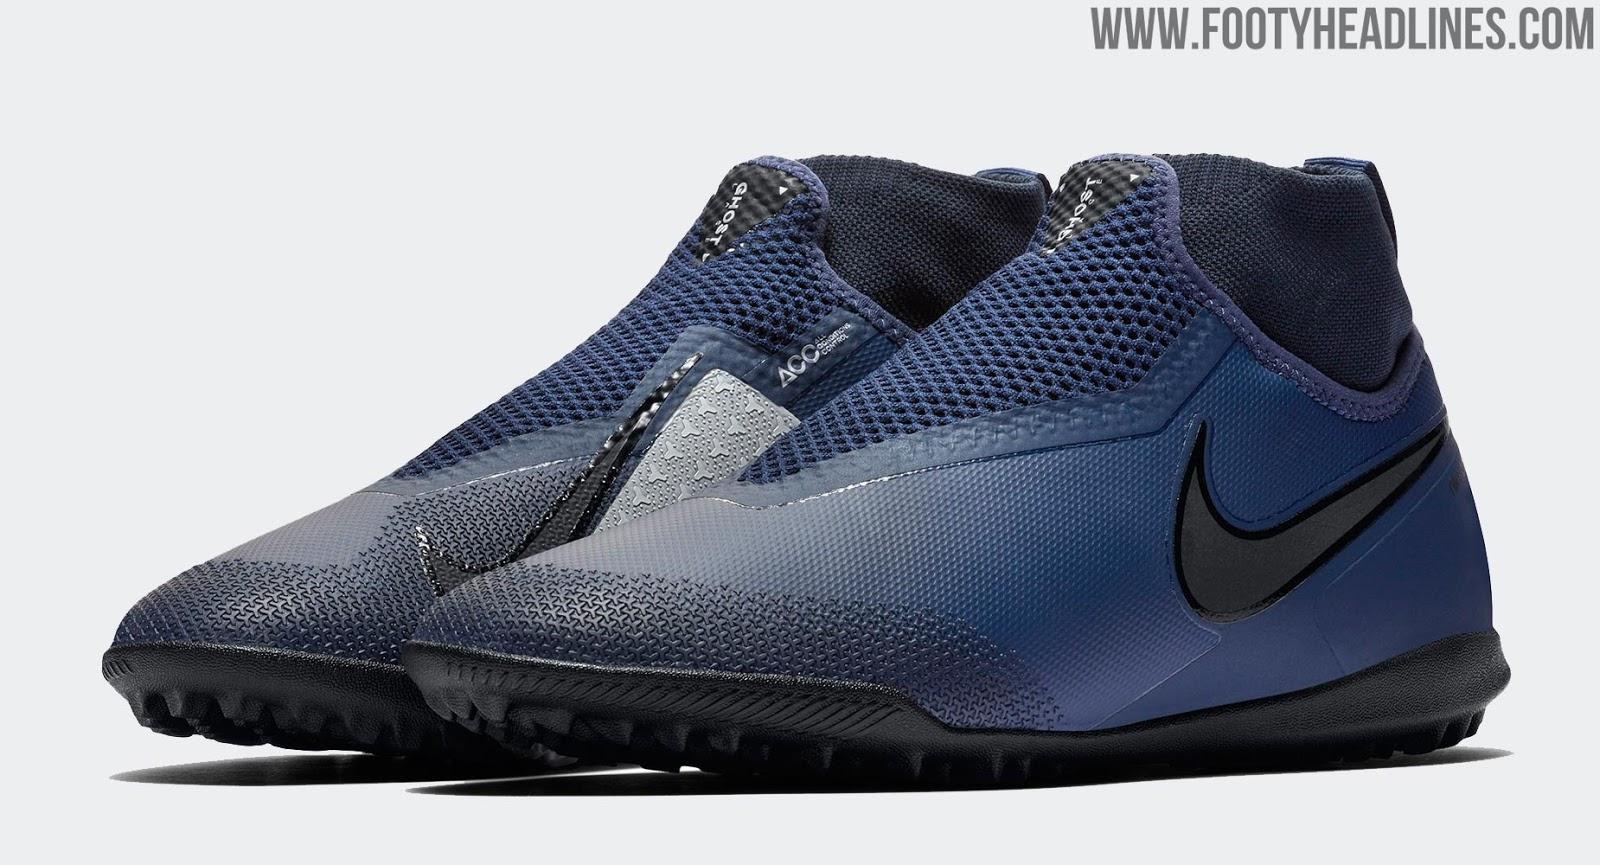 2da0f6f56d9 Special  Midnight Navy   Wolf Grey   Nike React Phantom VSN Boots Released